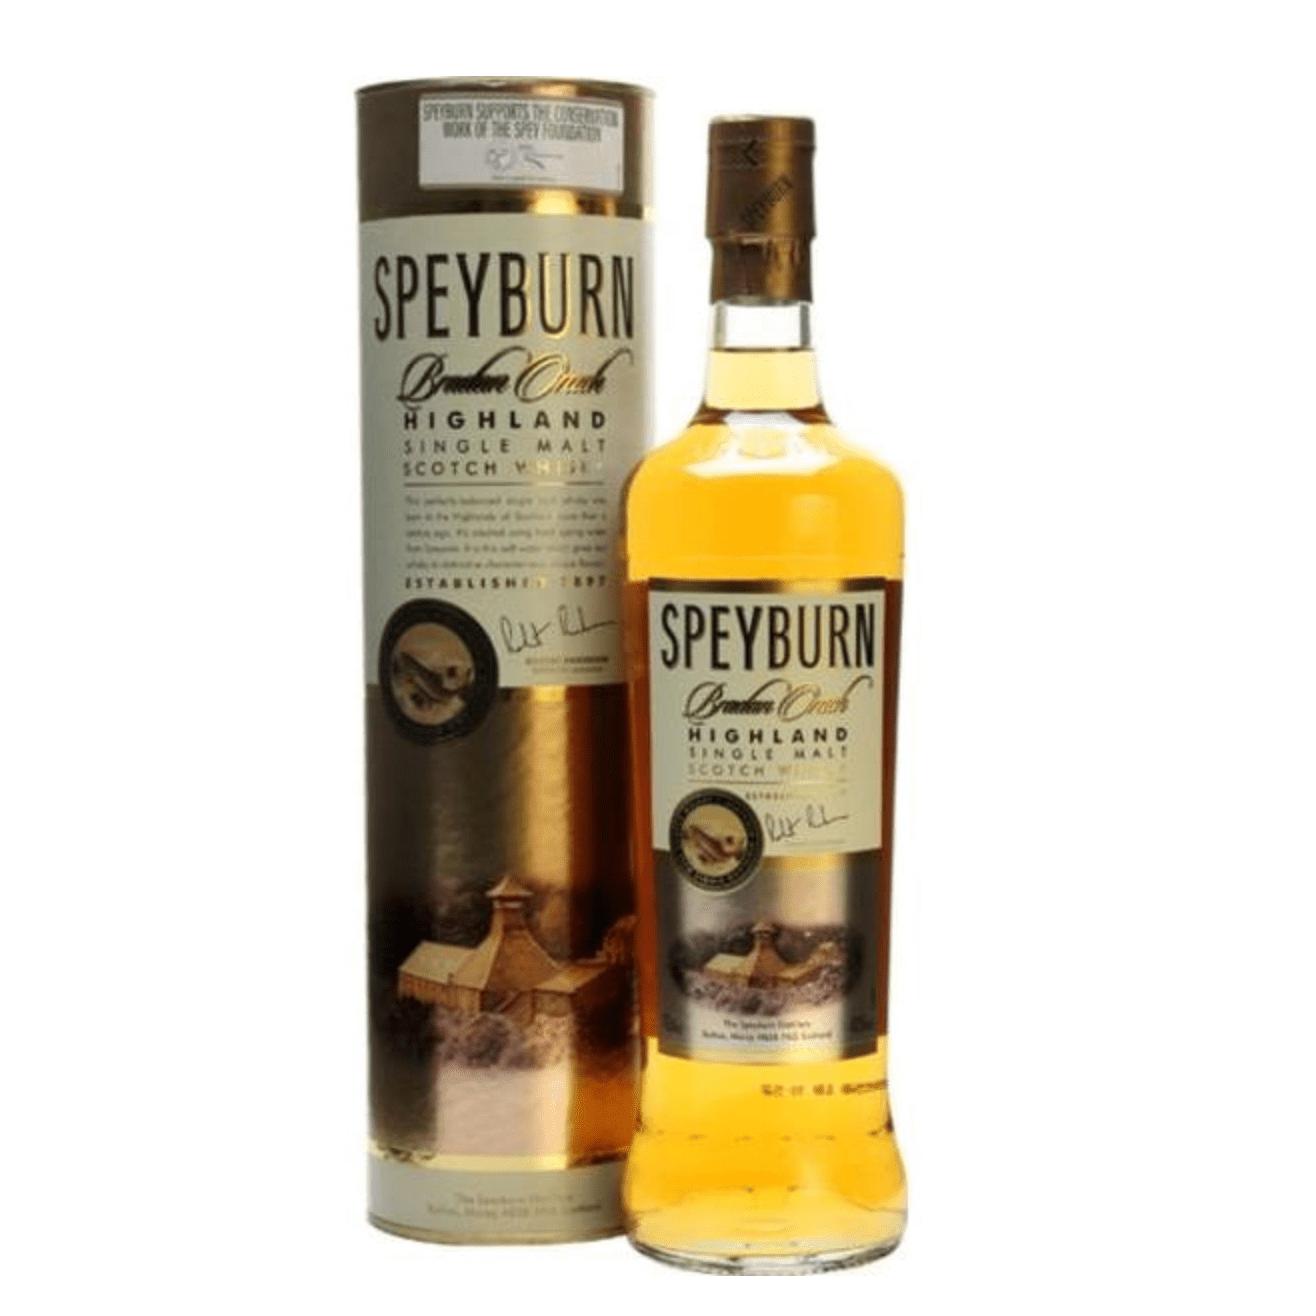 Speyburn Bradan Orach Single Malt Scotch Whisky